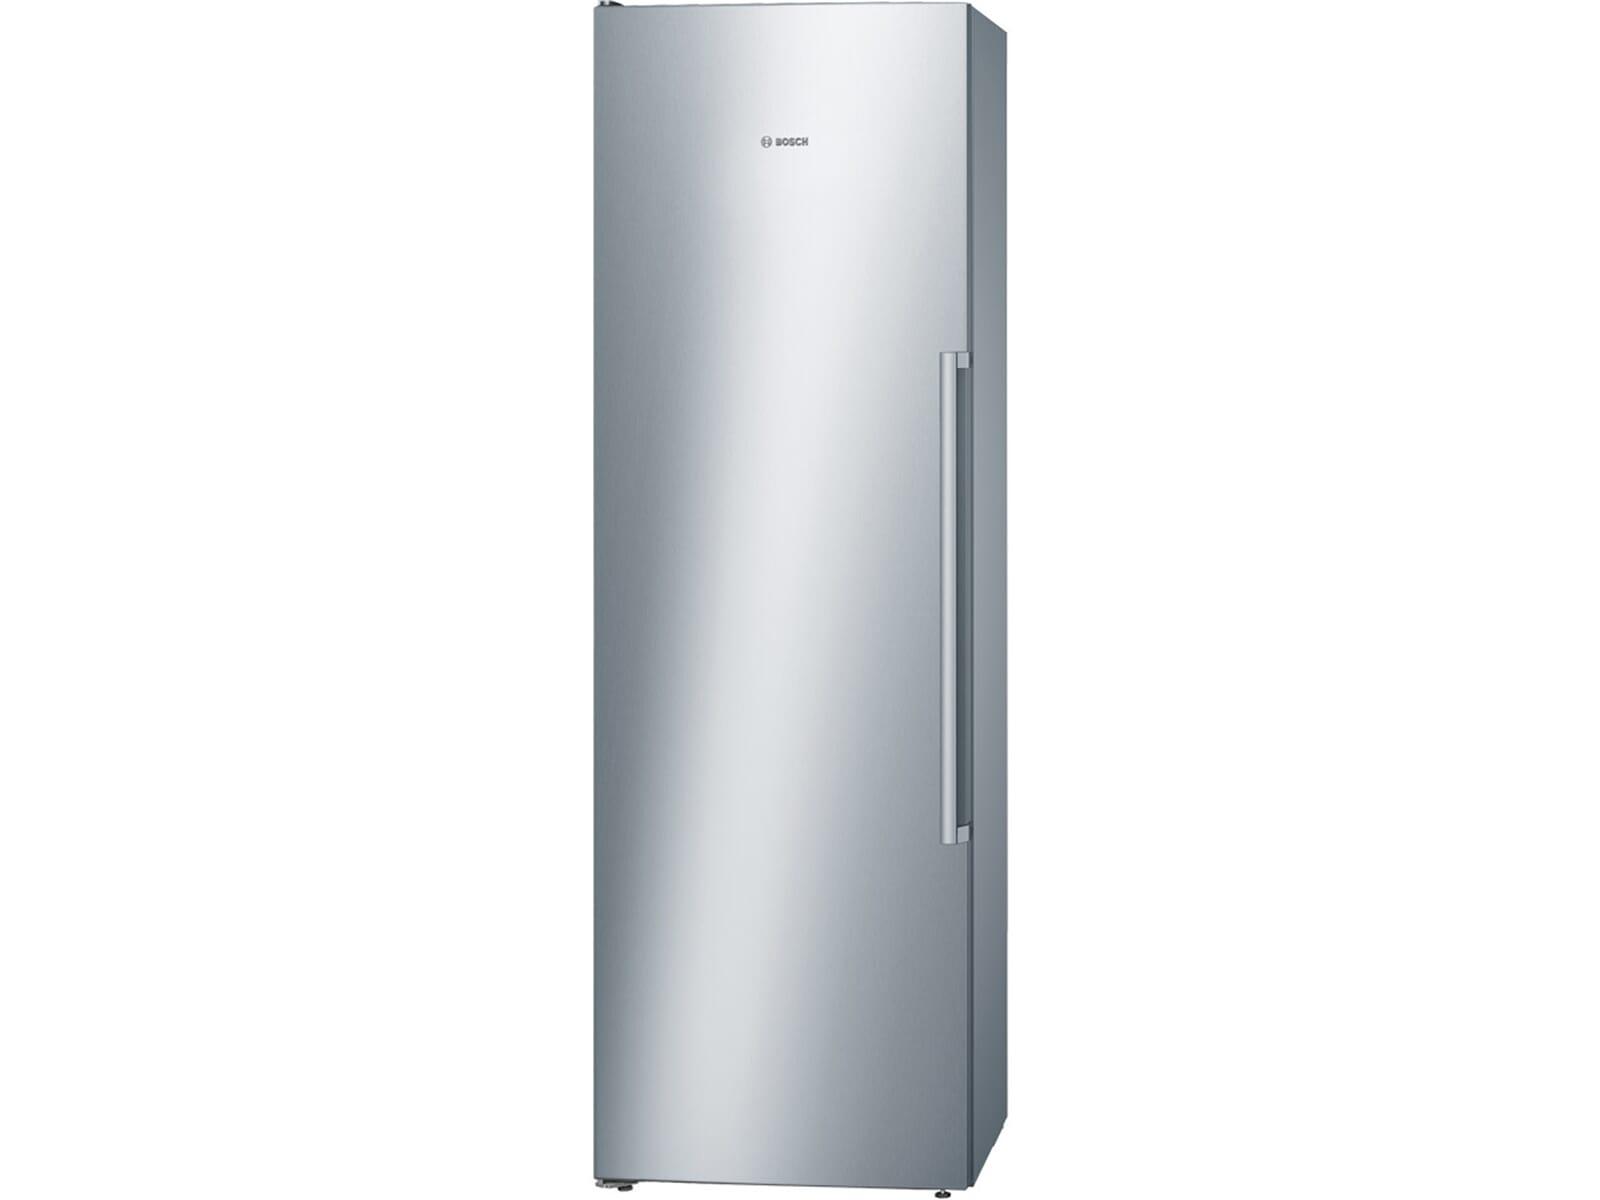 Bosch Kühlschrank A : Купить bosch kgv vl stand kühl gefrier kombination edelstahl